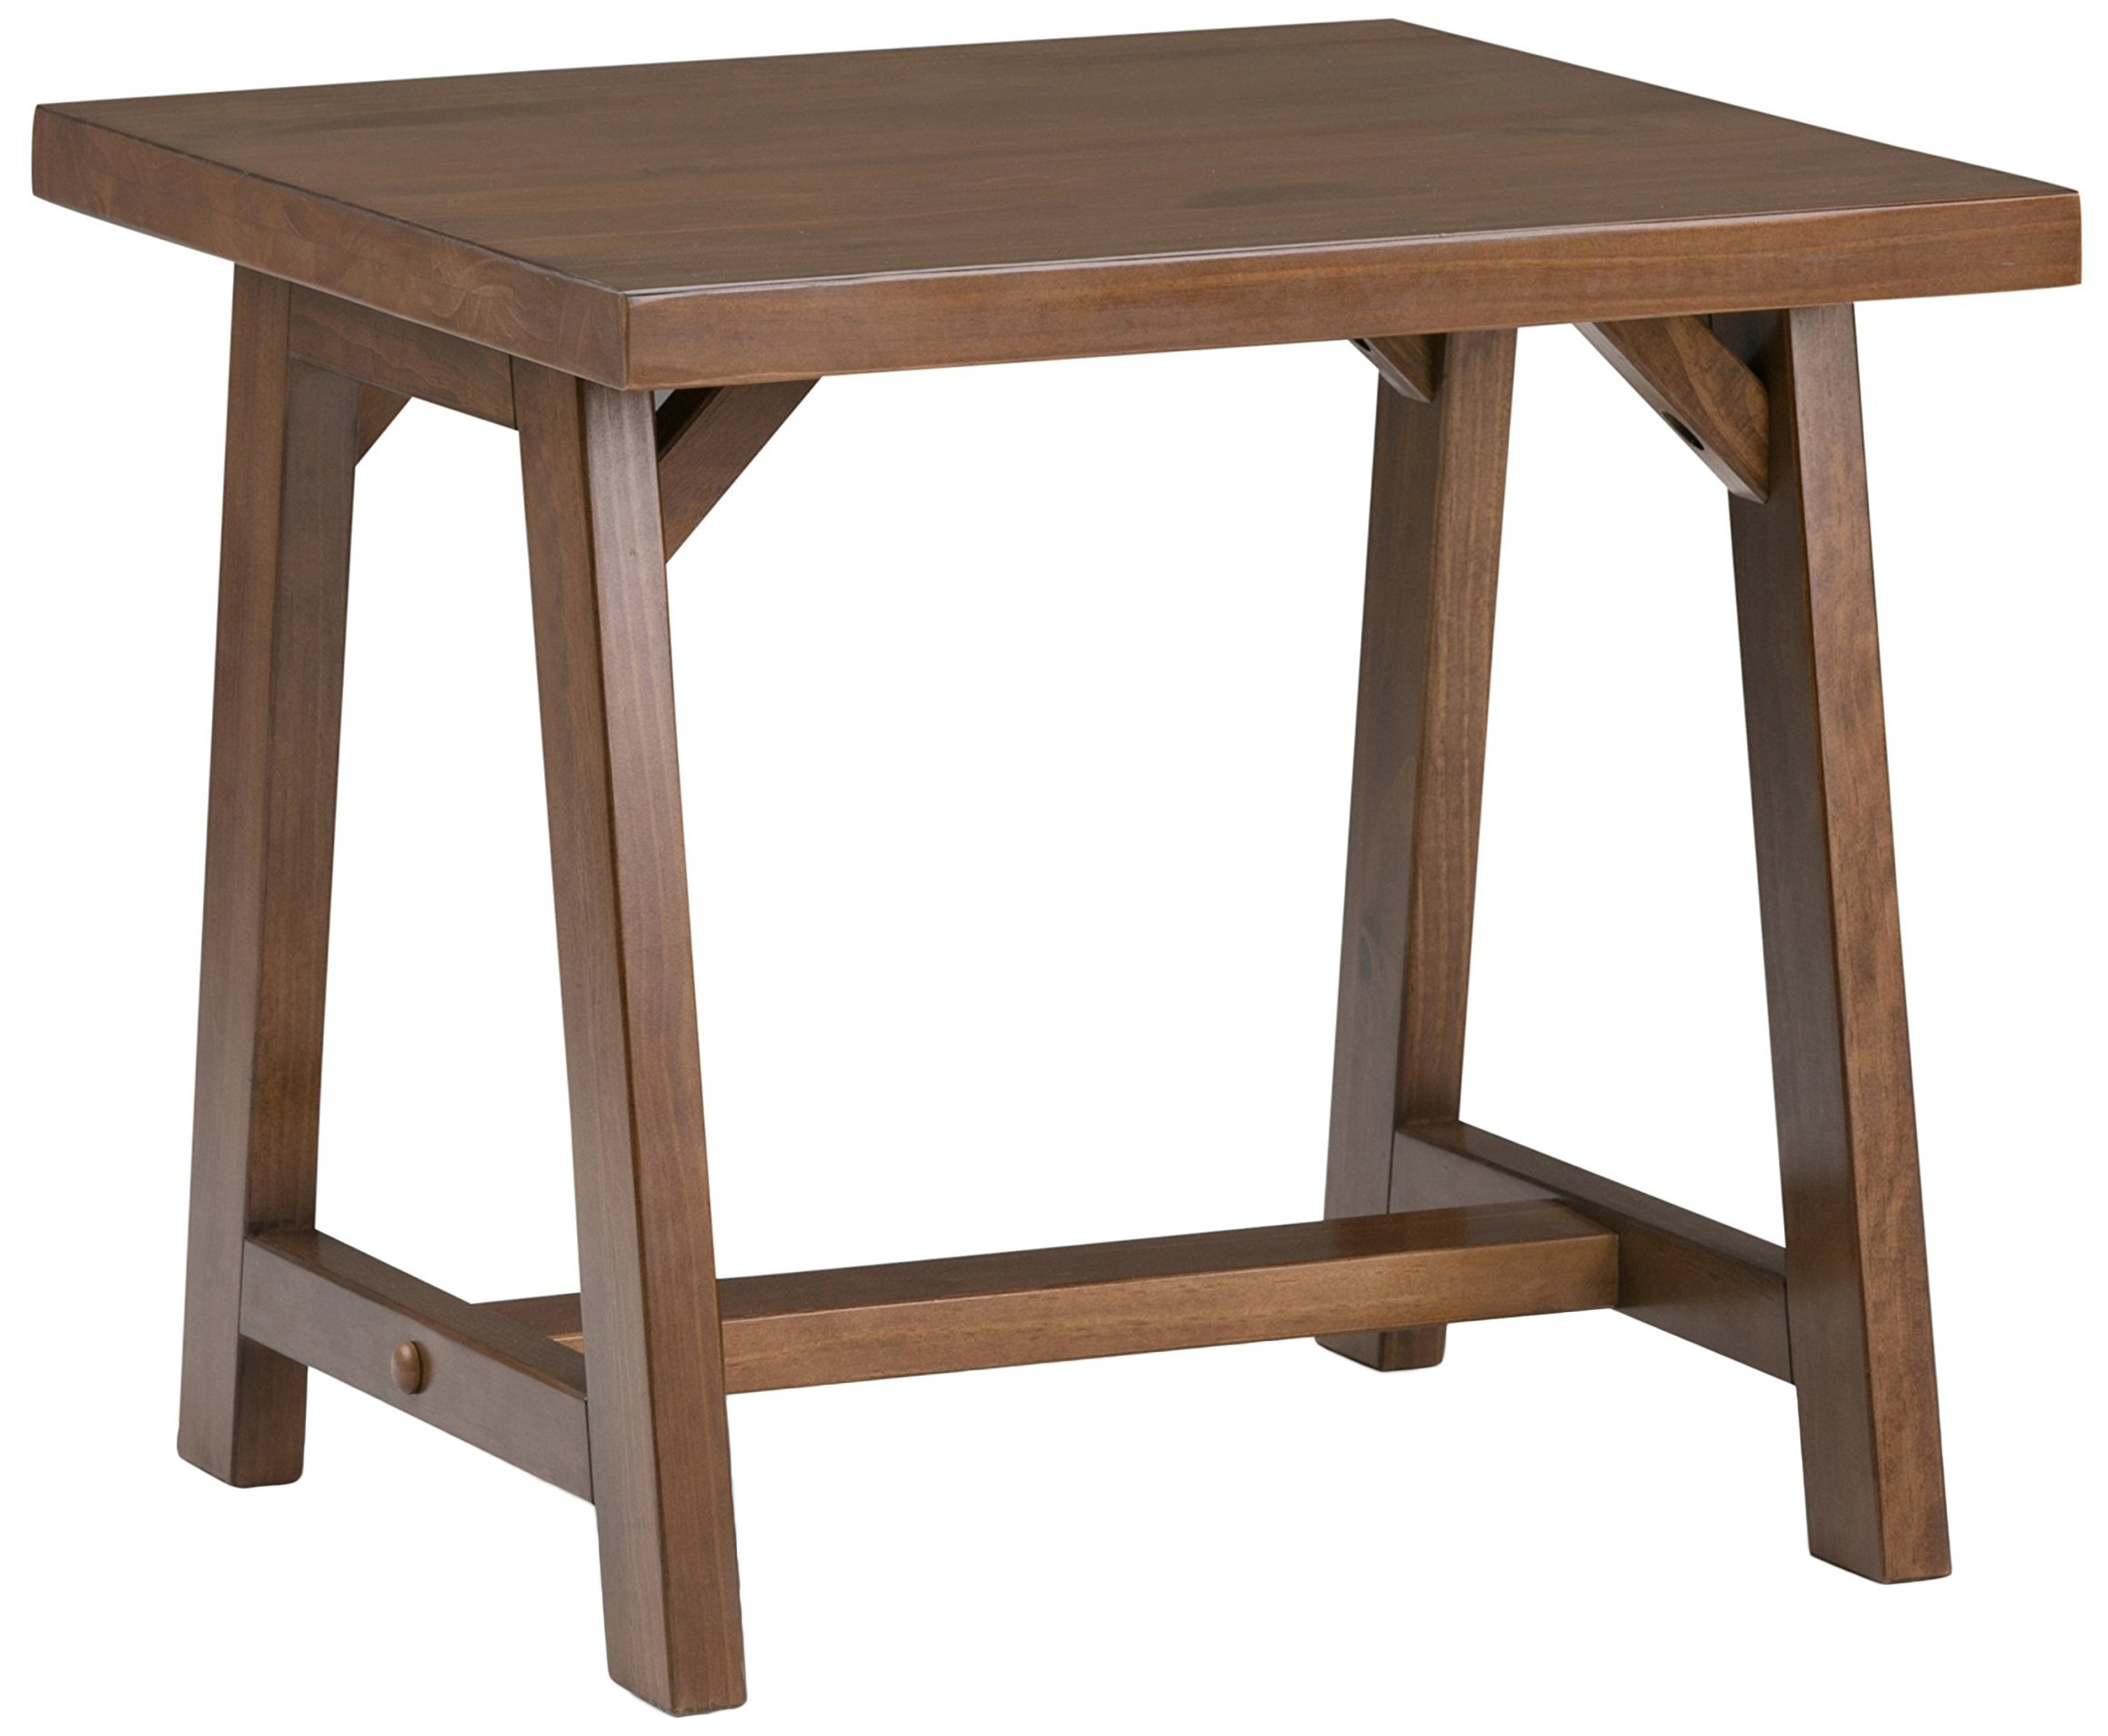 Simpli Home Sawhorse Solid Wood End Side Table, Medium Saddle Brown